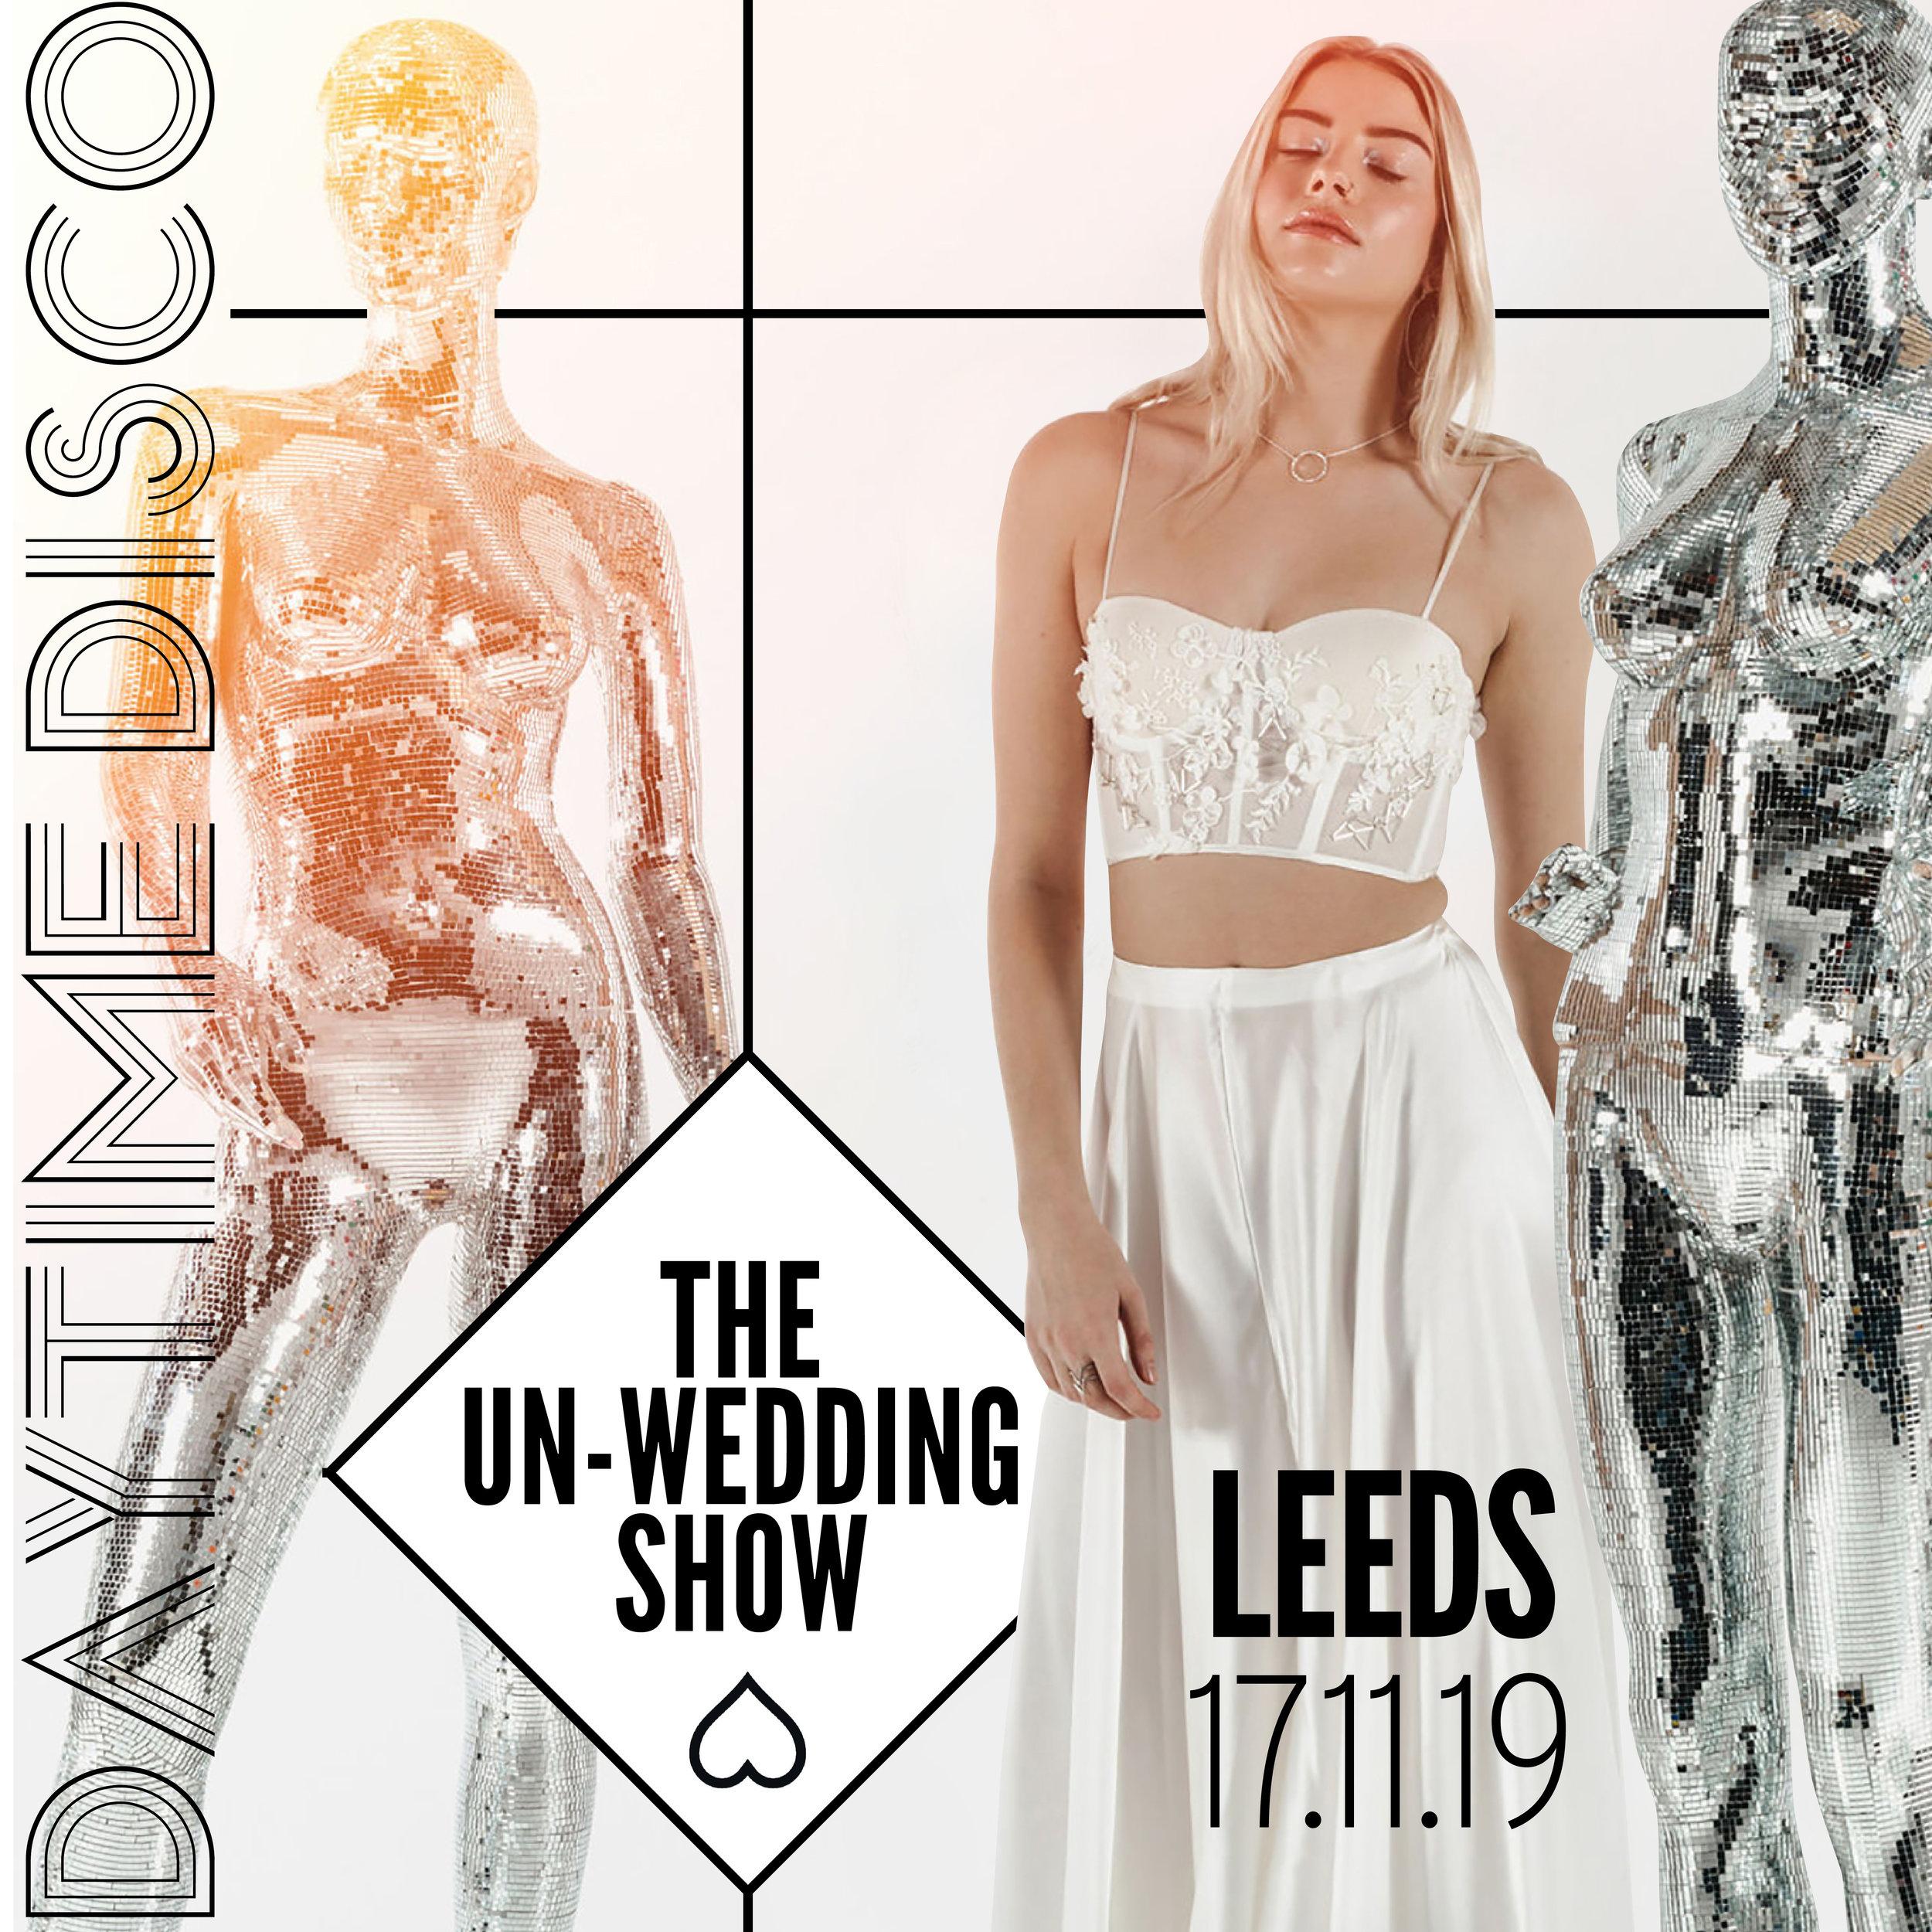 The Un-Wedding Show Leeds.jpg